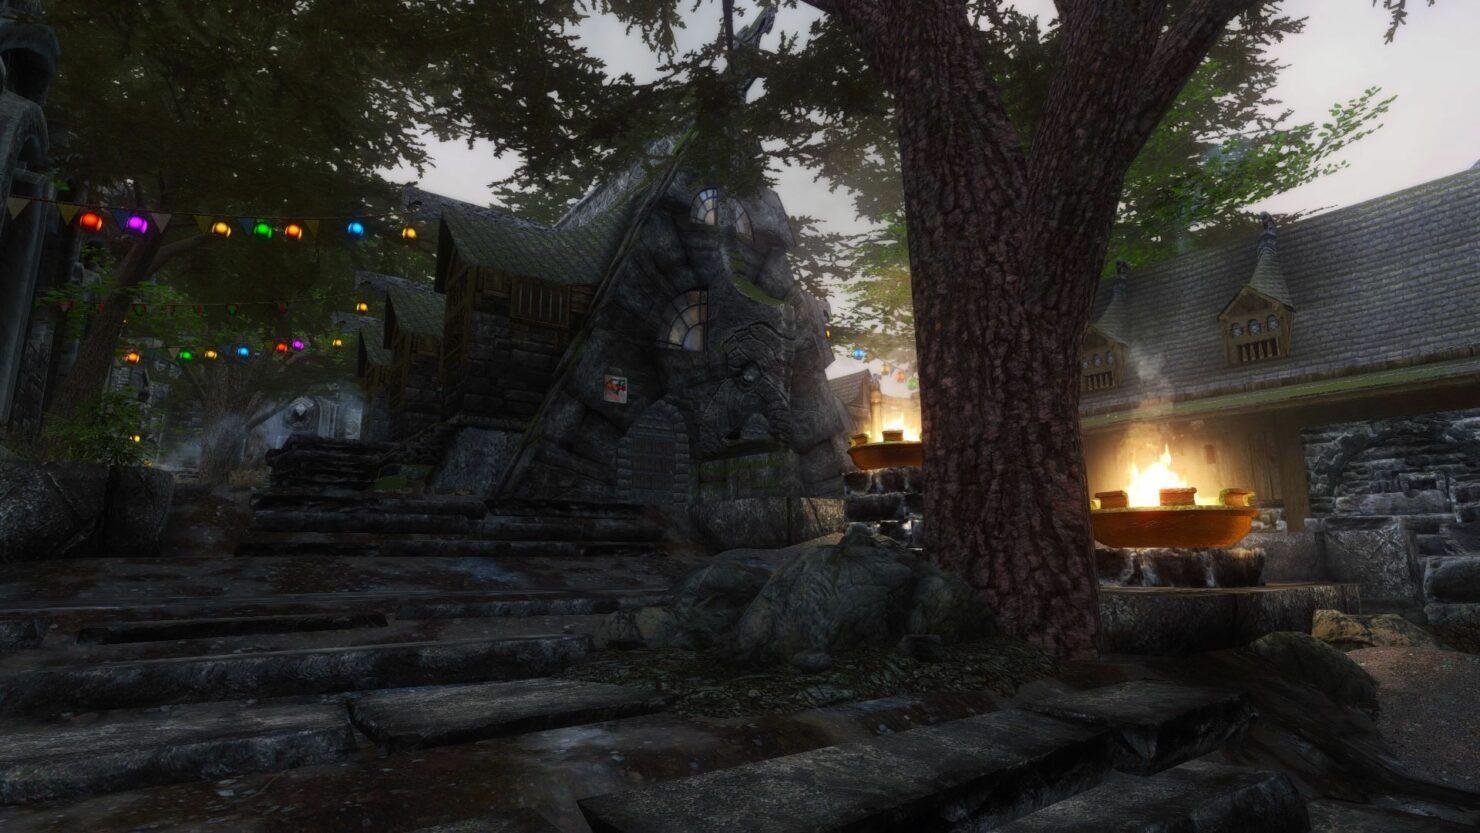 elder-scrolls-v-skyrim-legendary-edition-project-rainforest-mod-update-5